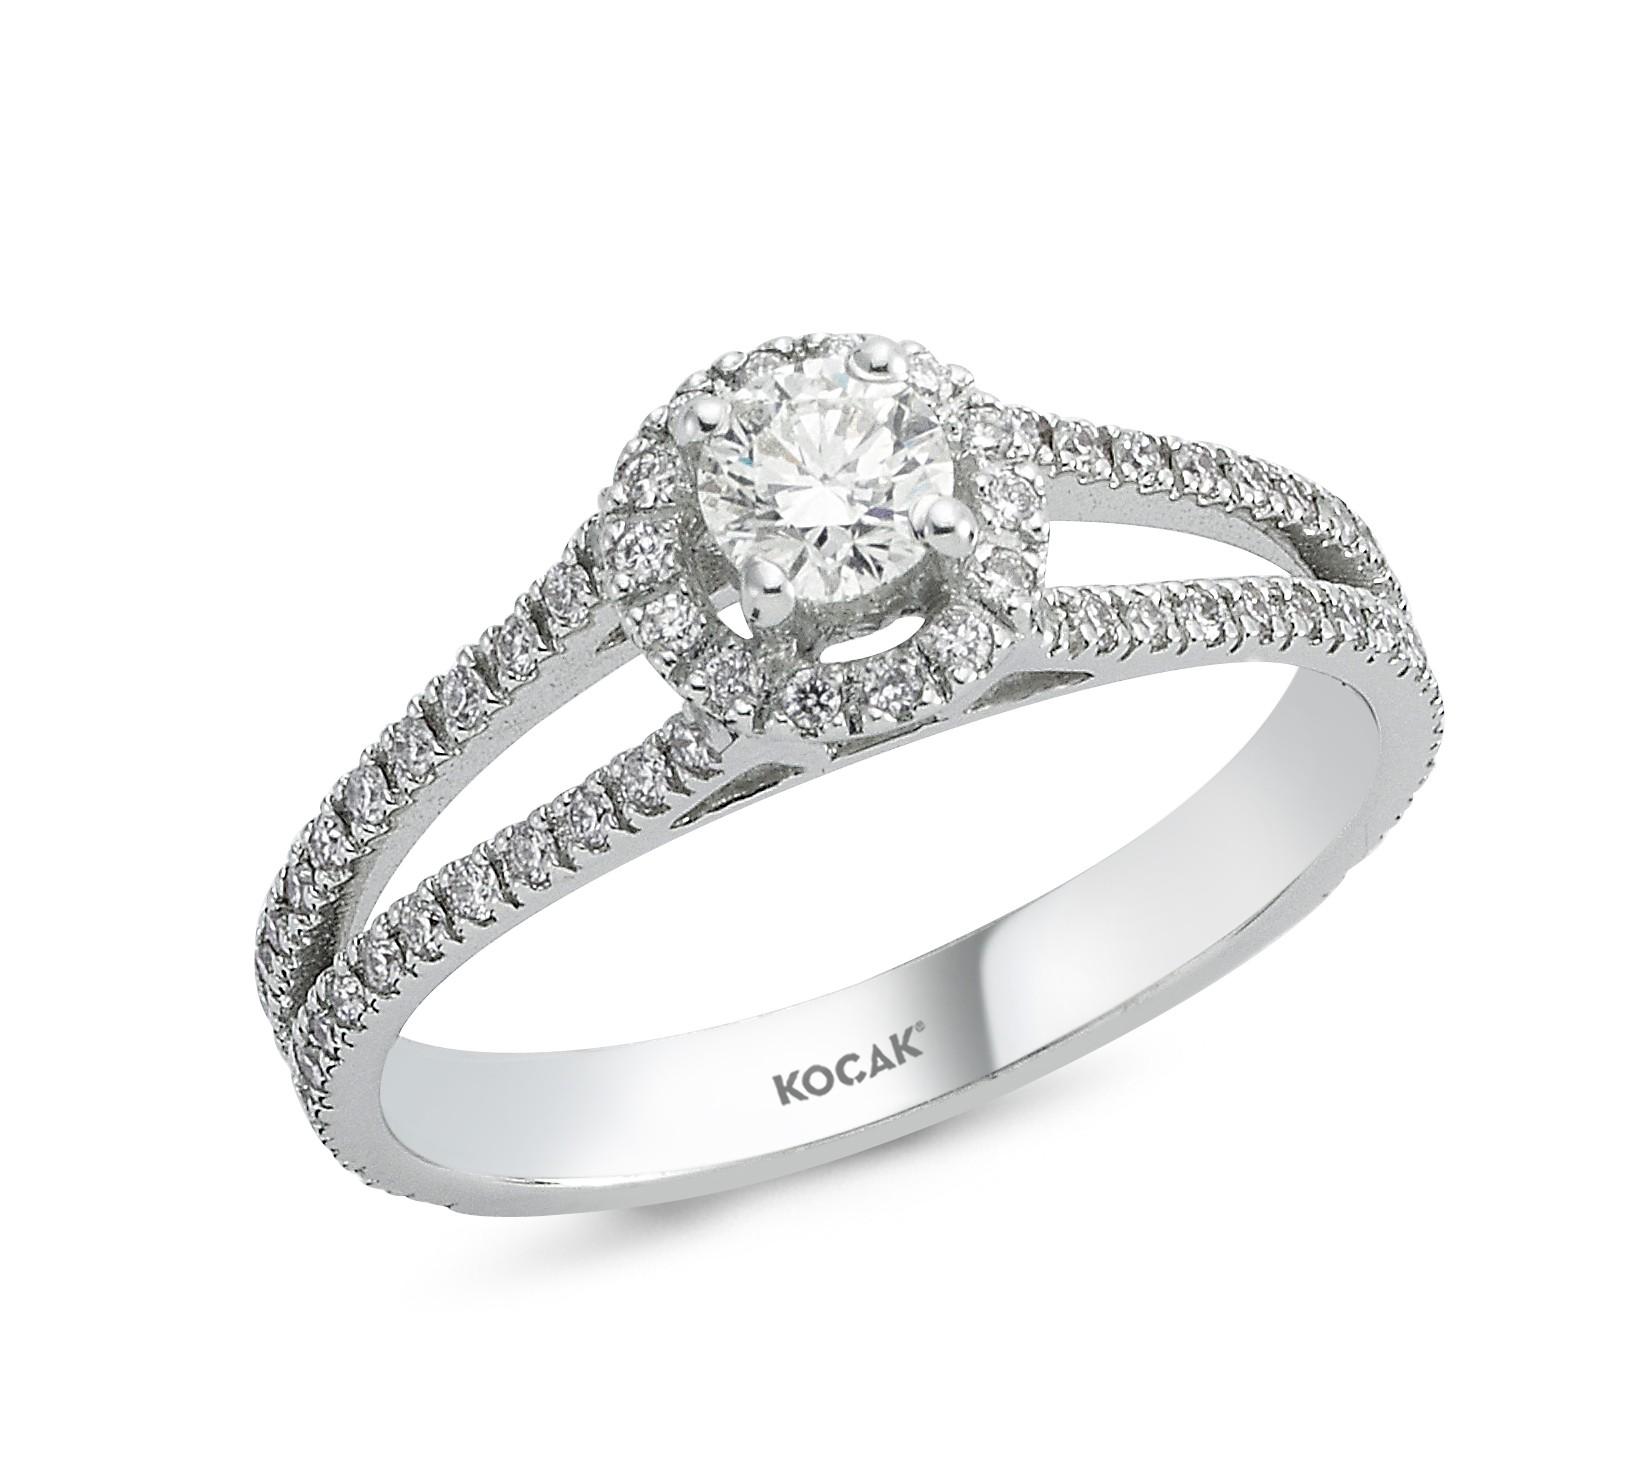 585 Kocak Weißold Ring | PIRLANTA YÜZÜK